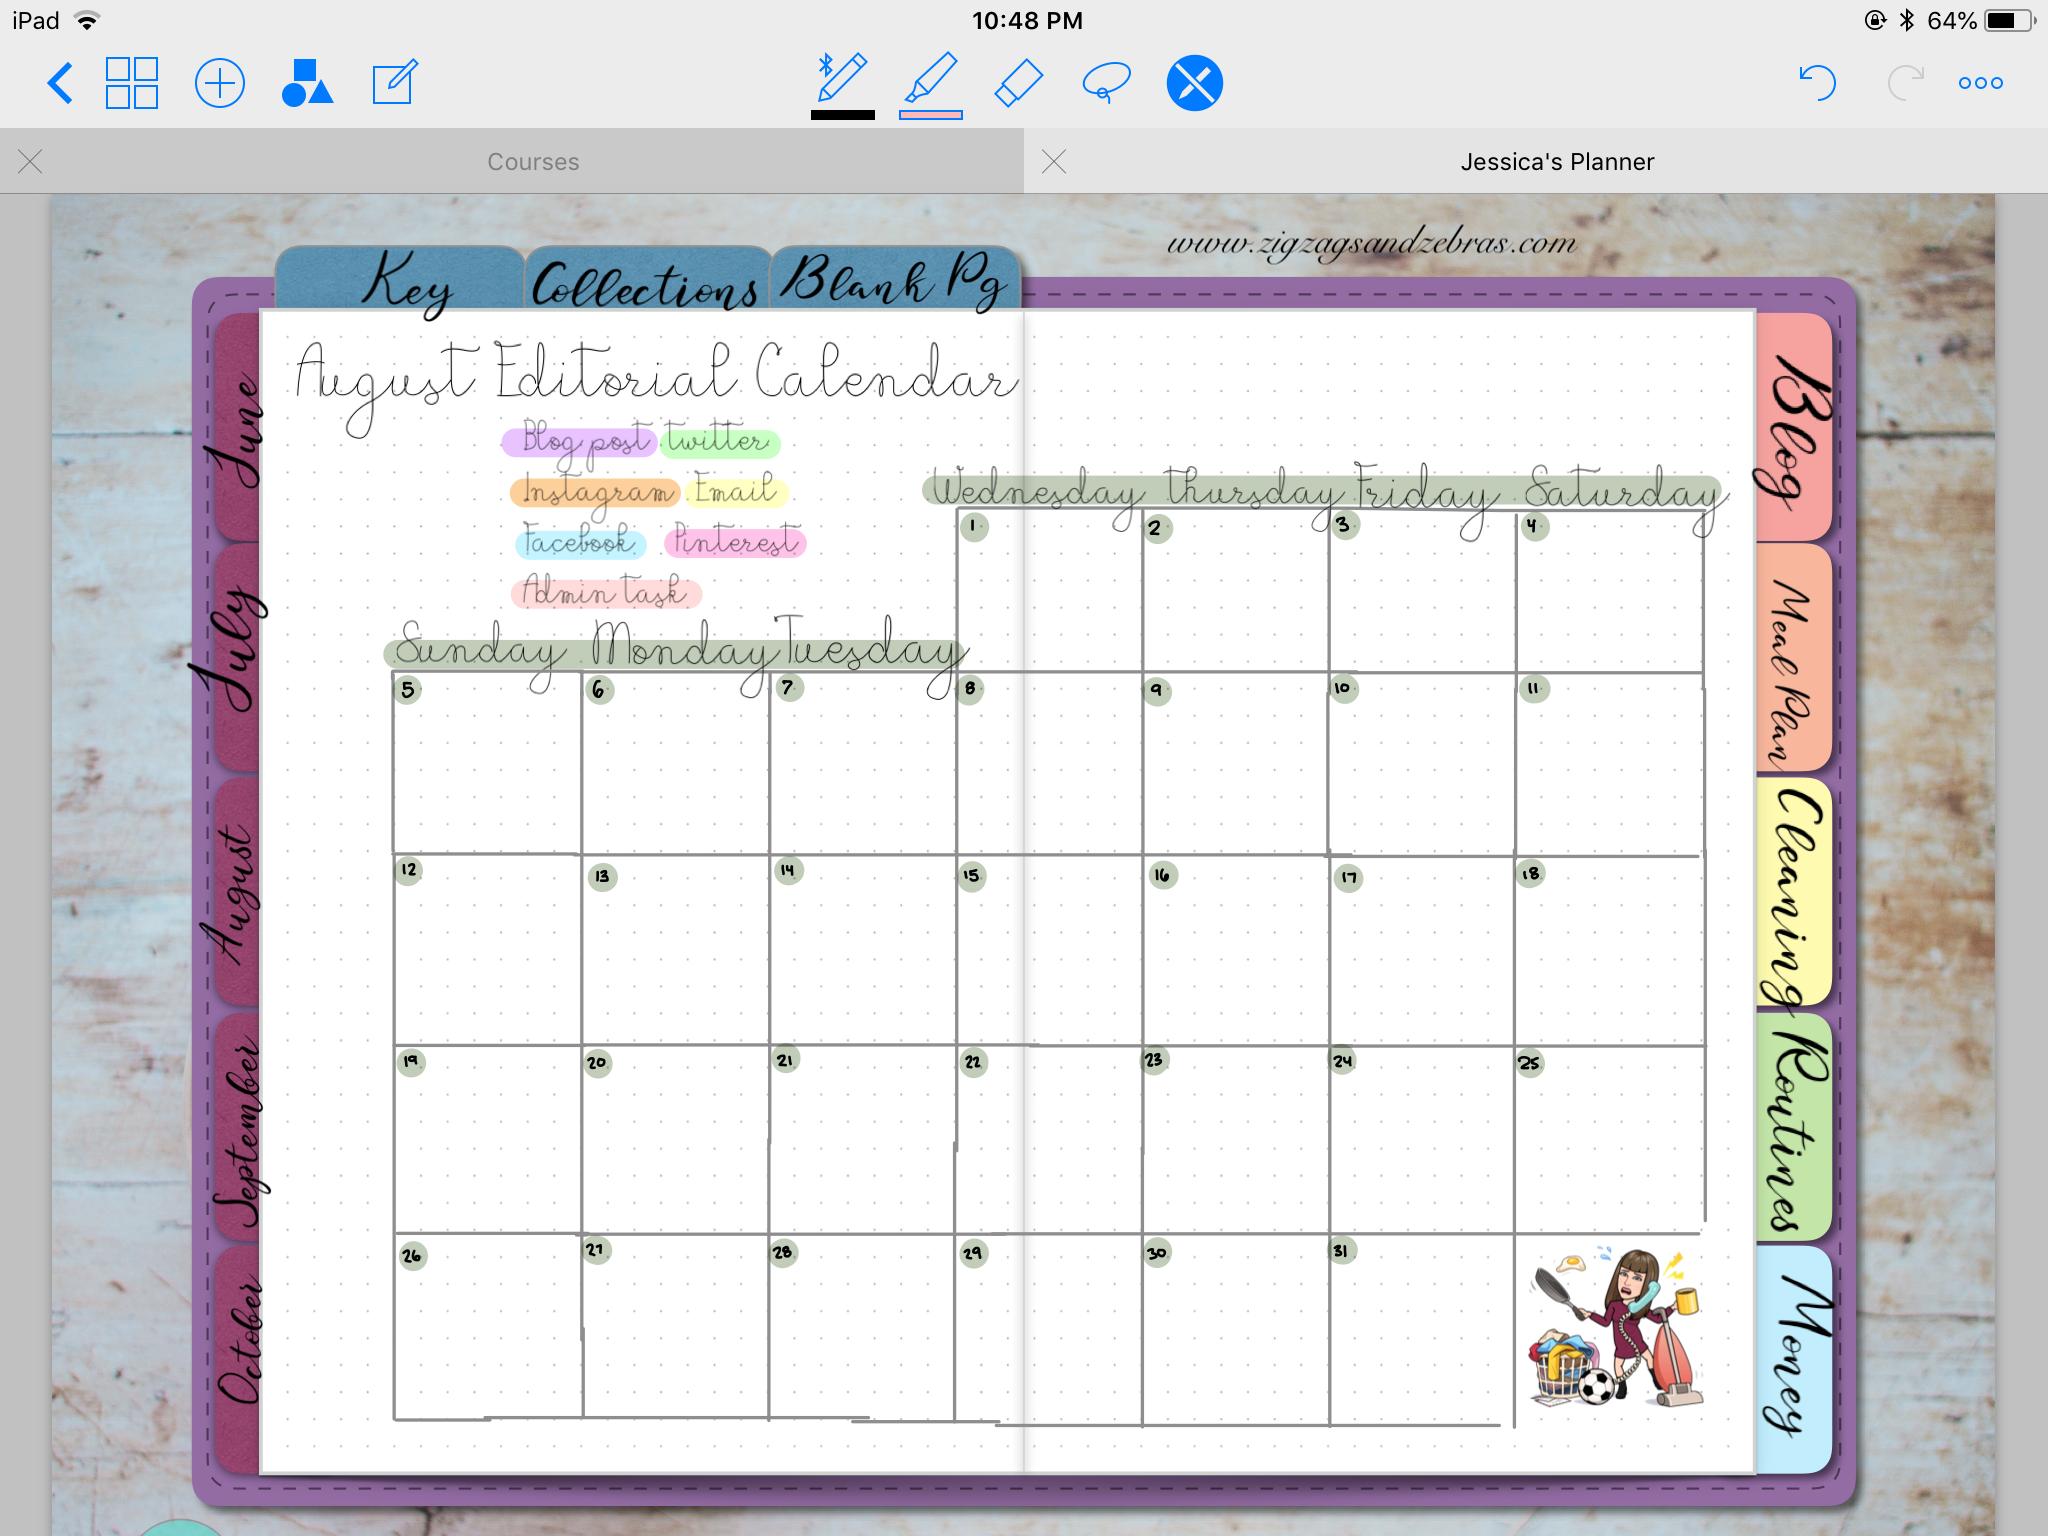 DIGITAL PLANNER SETUP | august digital planner layouts, digital bullet journal, monthly layout, monthly spread, editorial calendar, time blocking, time management